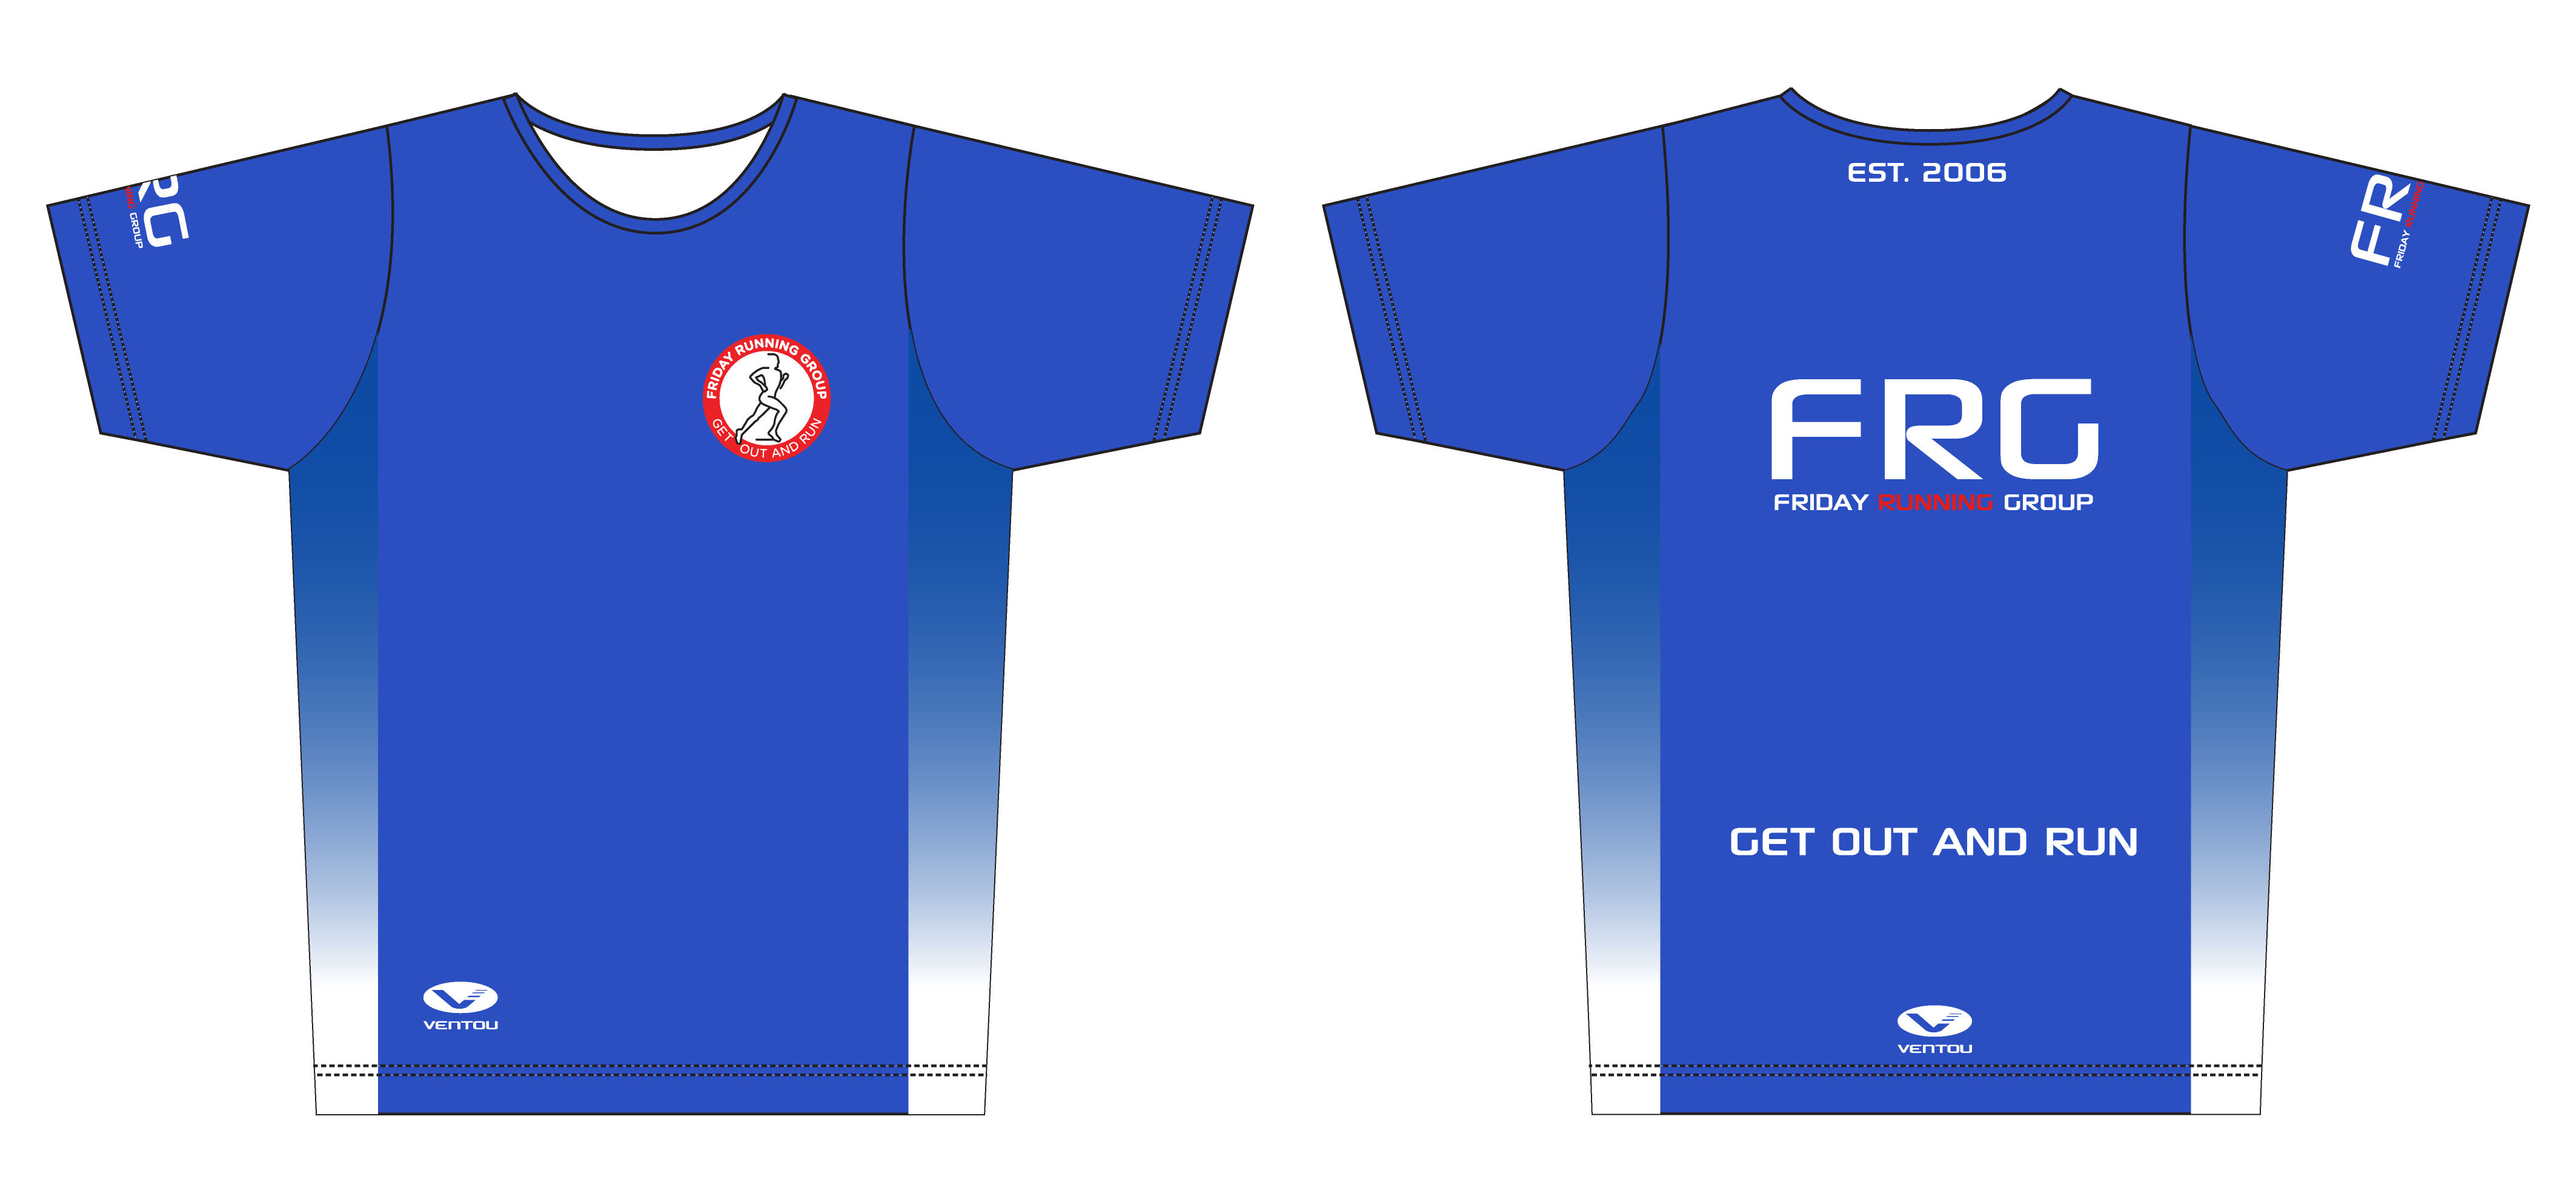 tshirt-friday-running-group